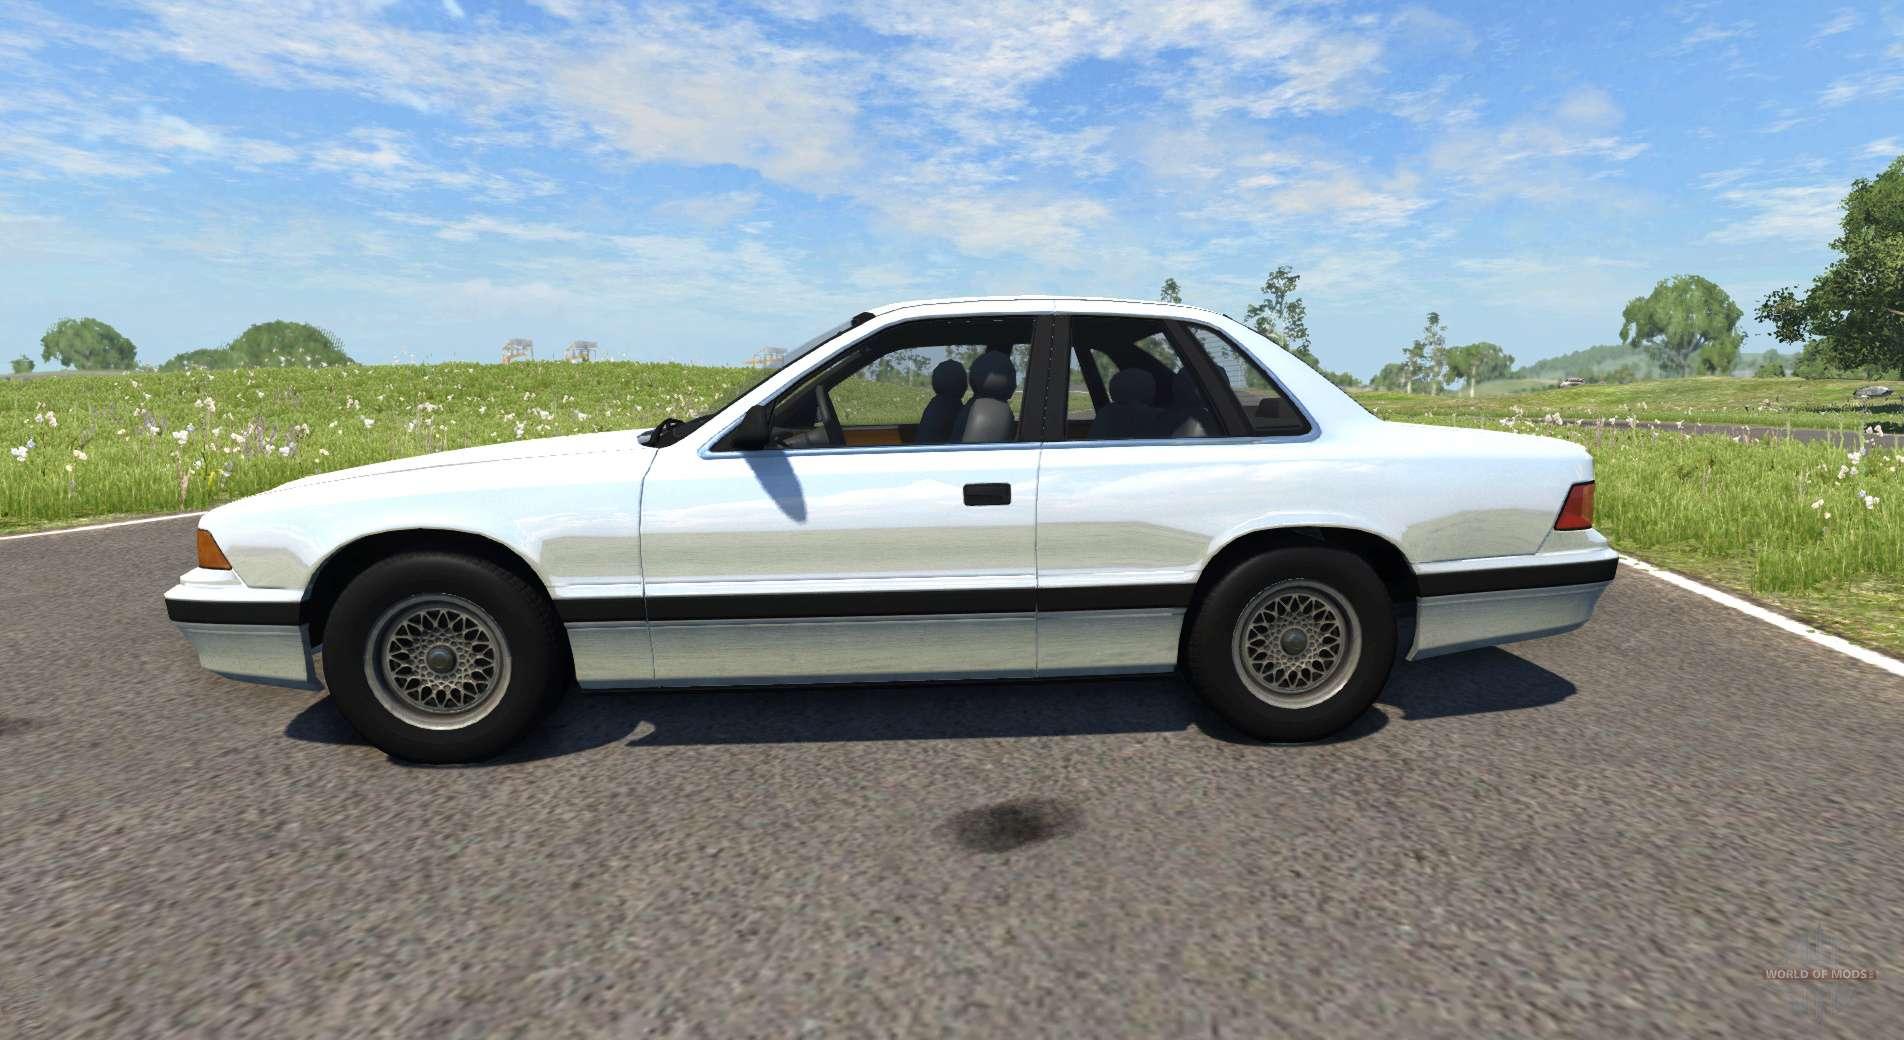 Grand marshal coupe for beamng drive gavril grand marshal coupe for beamng drive sciox Images